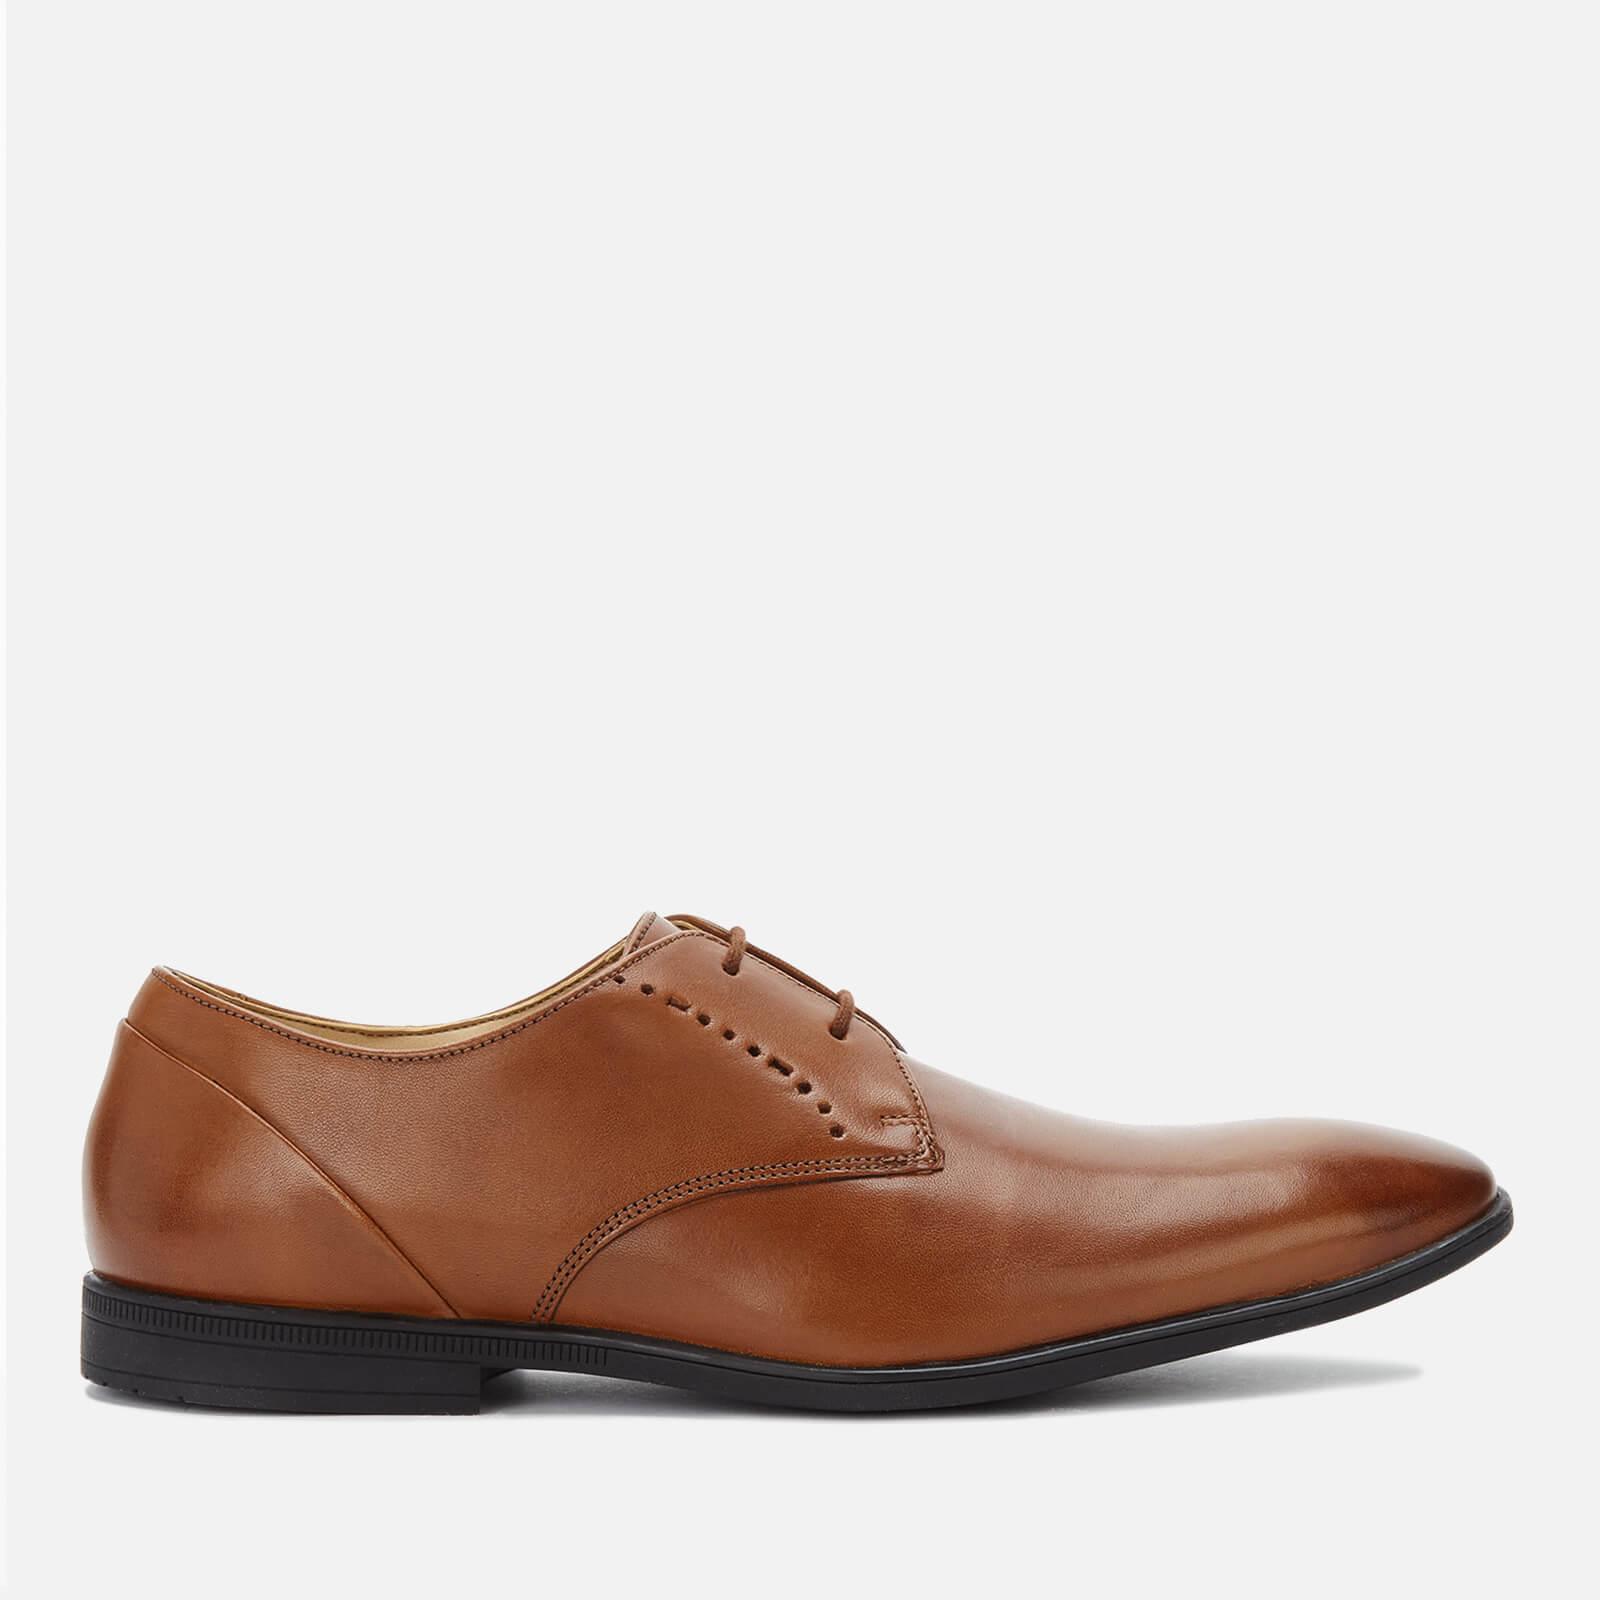 Clarks Men's Bampton Lace Leather Derby Shoes - Tan - UK 9